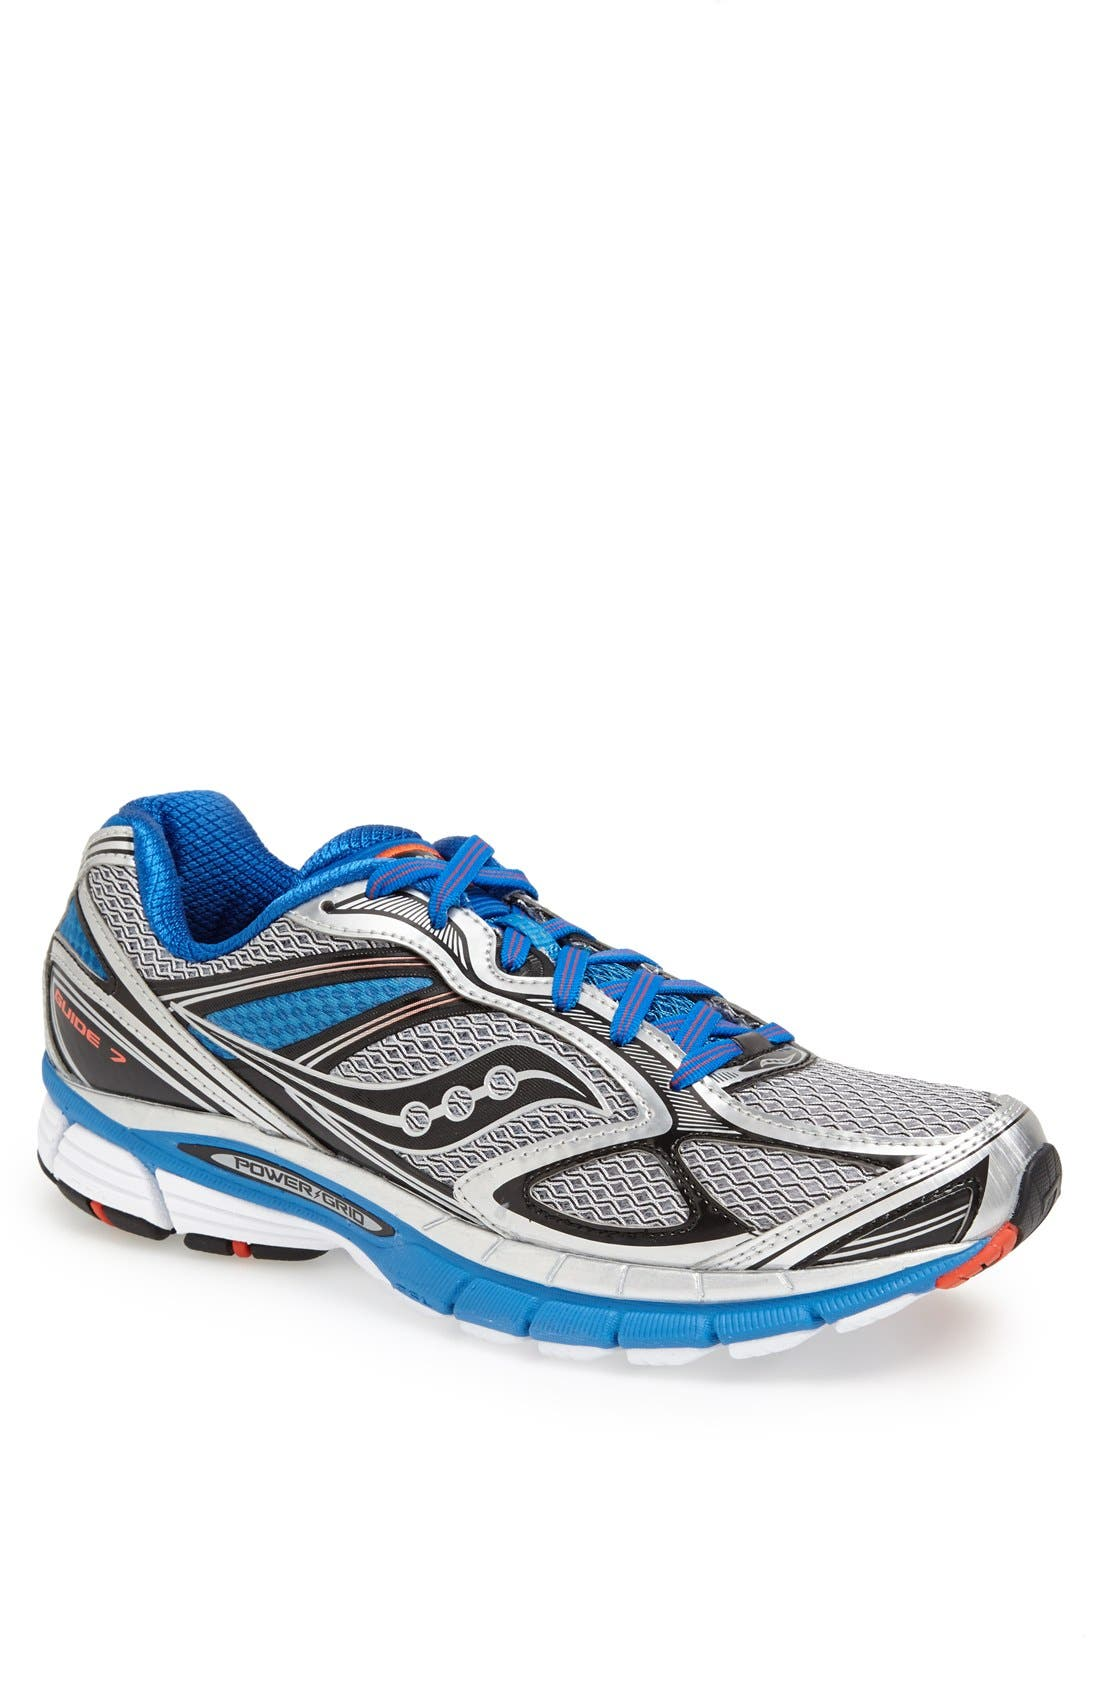 Alternate Image 1 Selected - Saucony 'Guide 7' Running Shoe (Men)